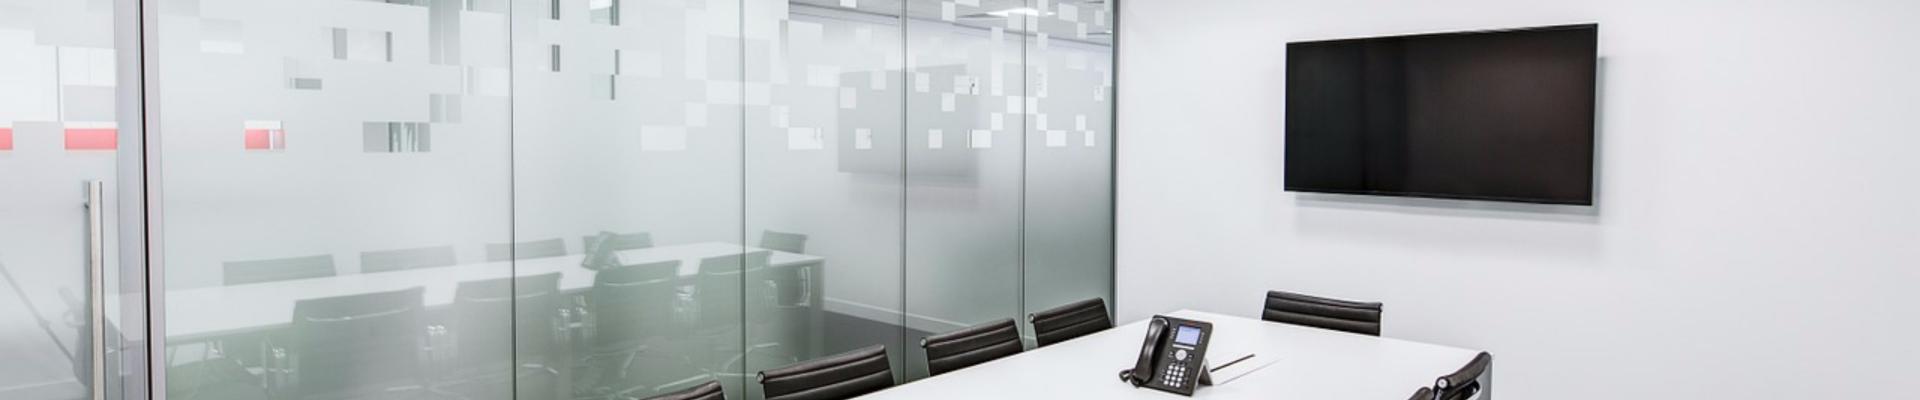 Meeting-Room-Main-compressor